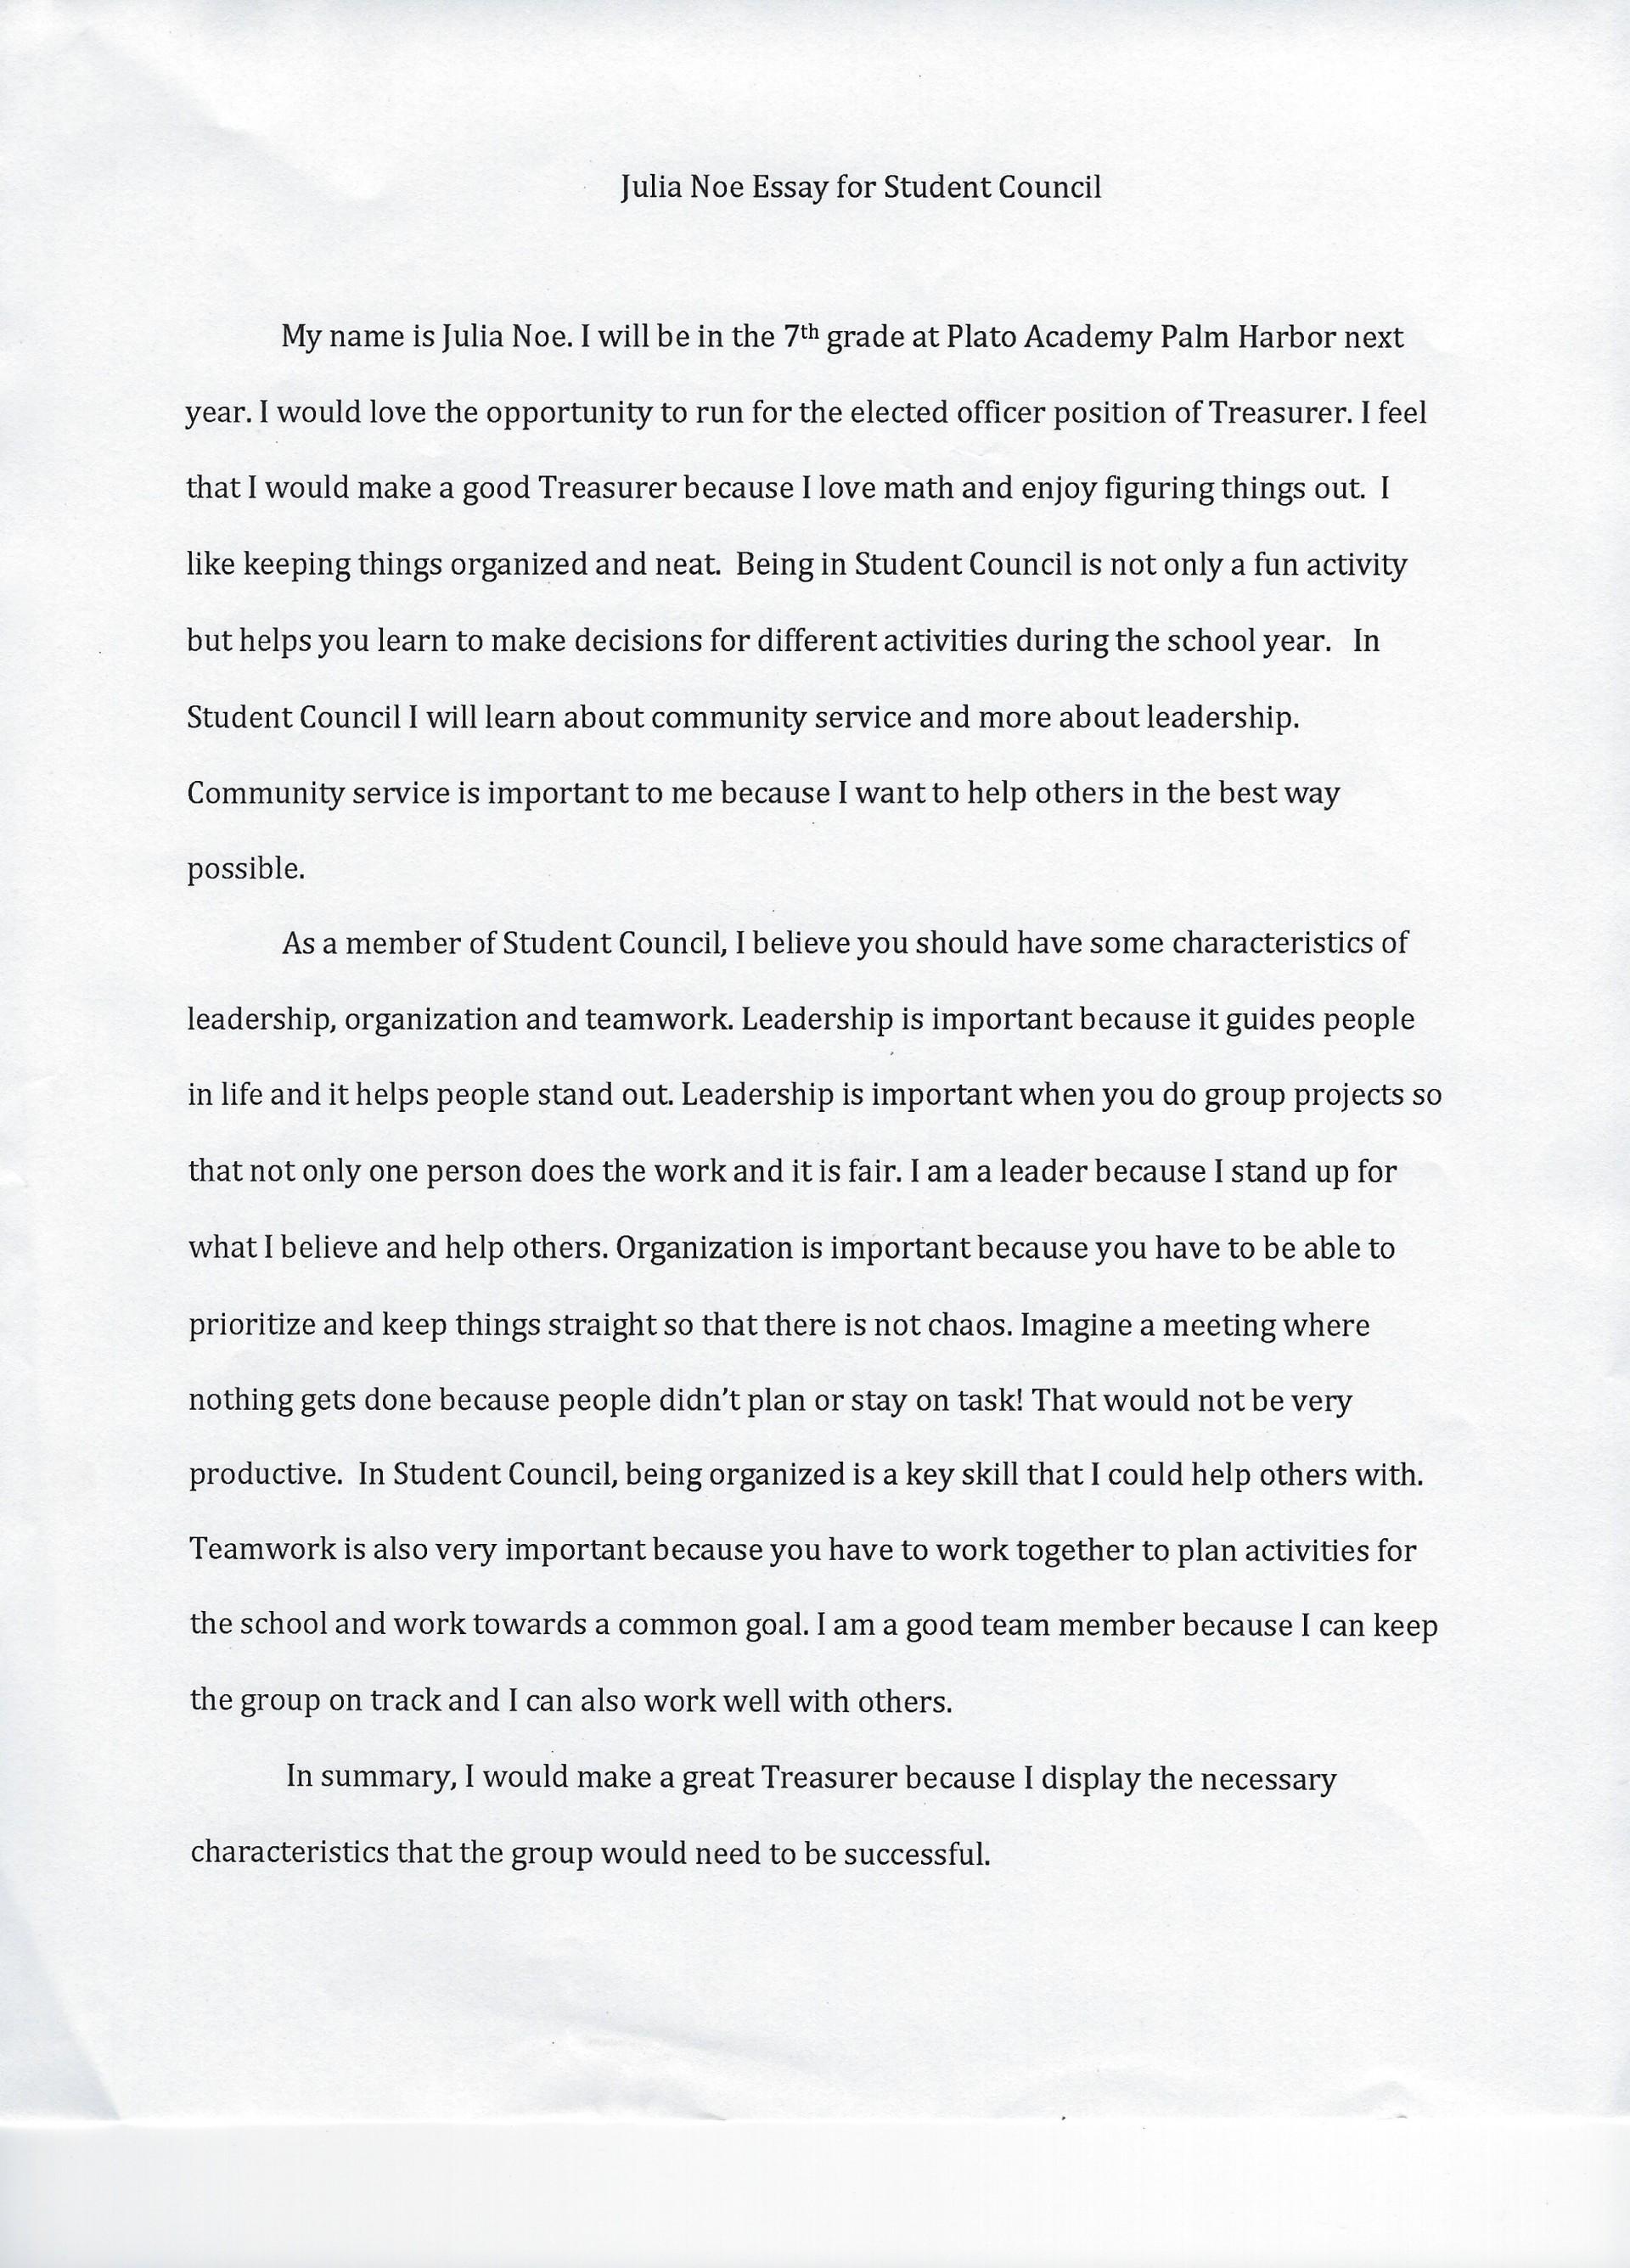 009 Student Council Essay Example Treasurer Noe Phenomenal Template For 5th Grade College 1920